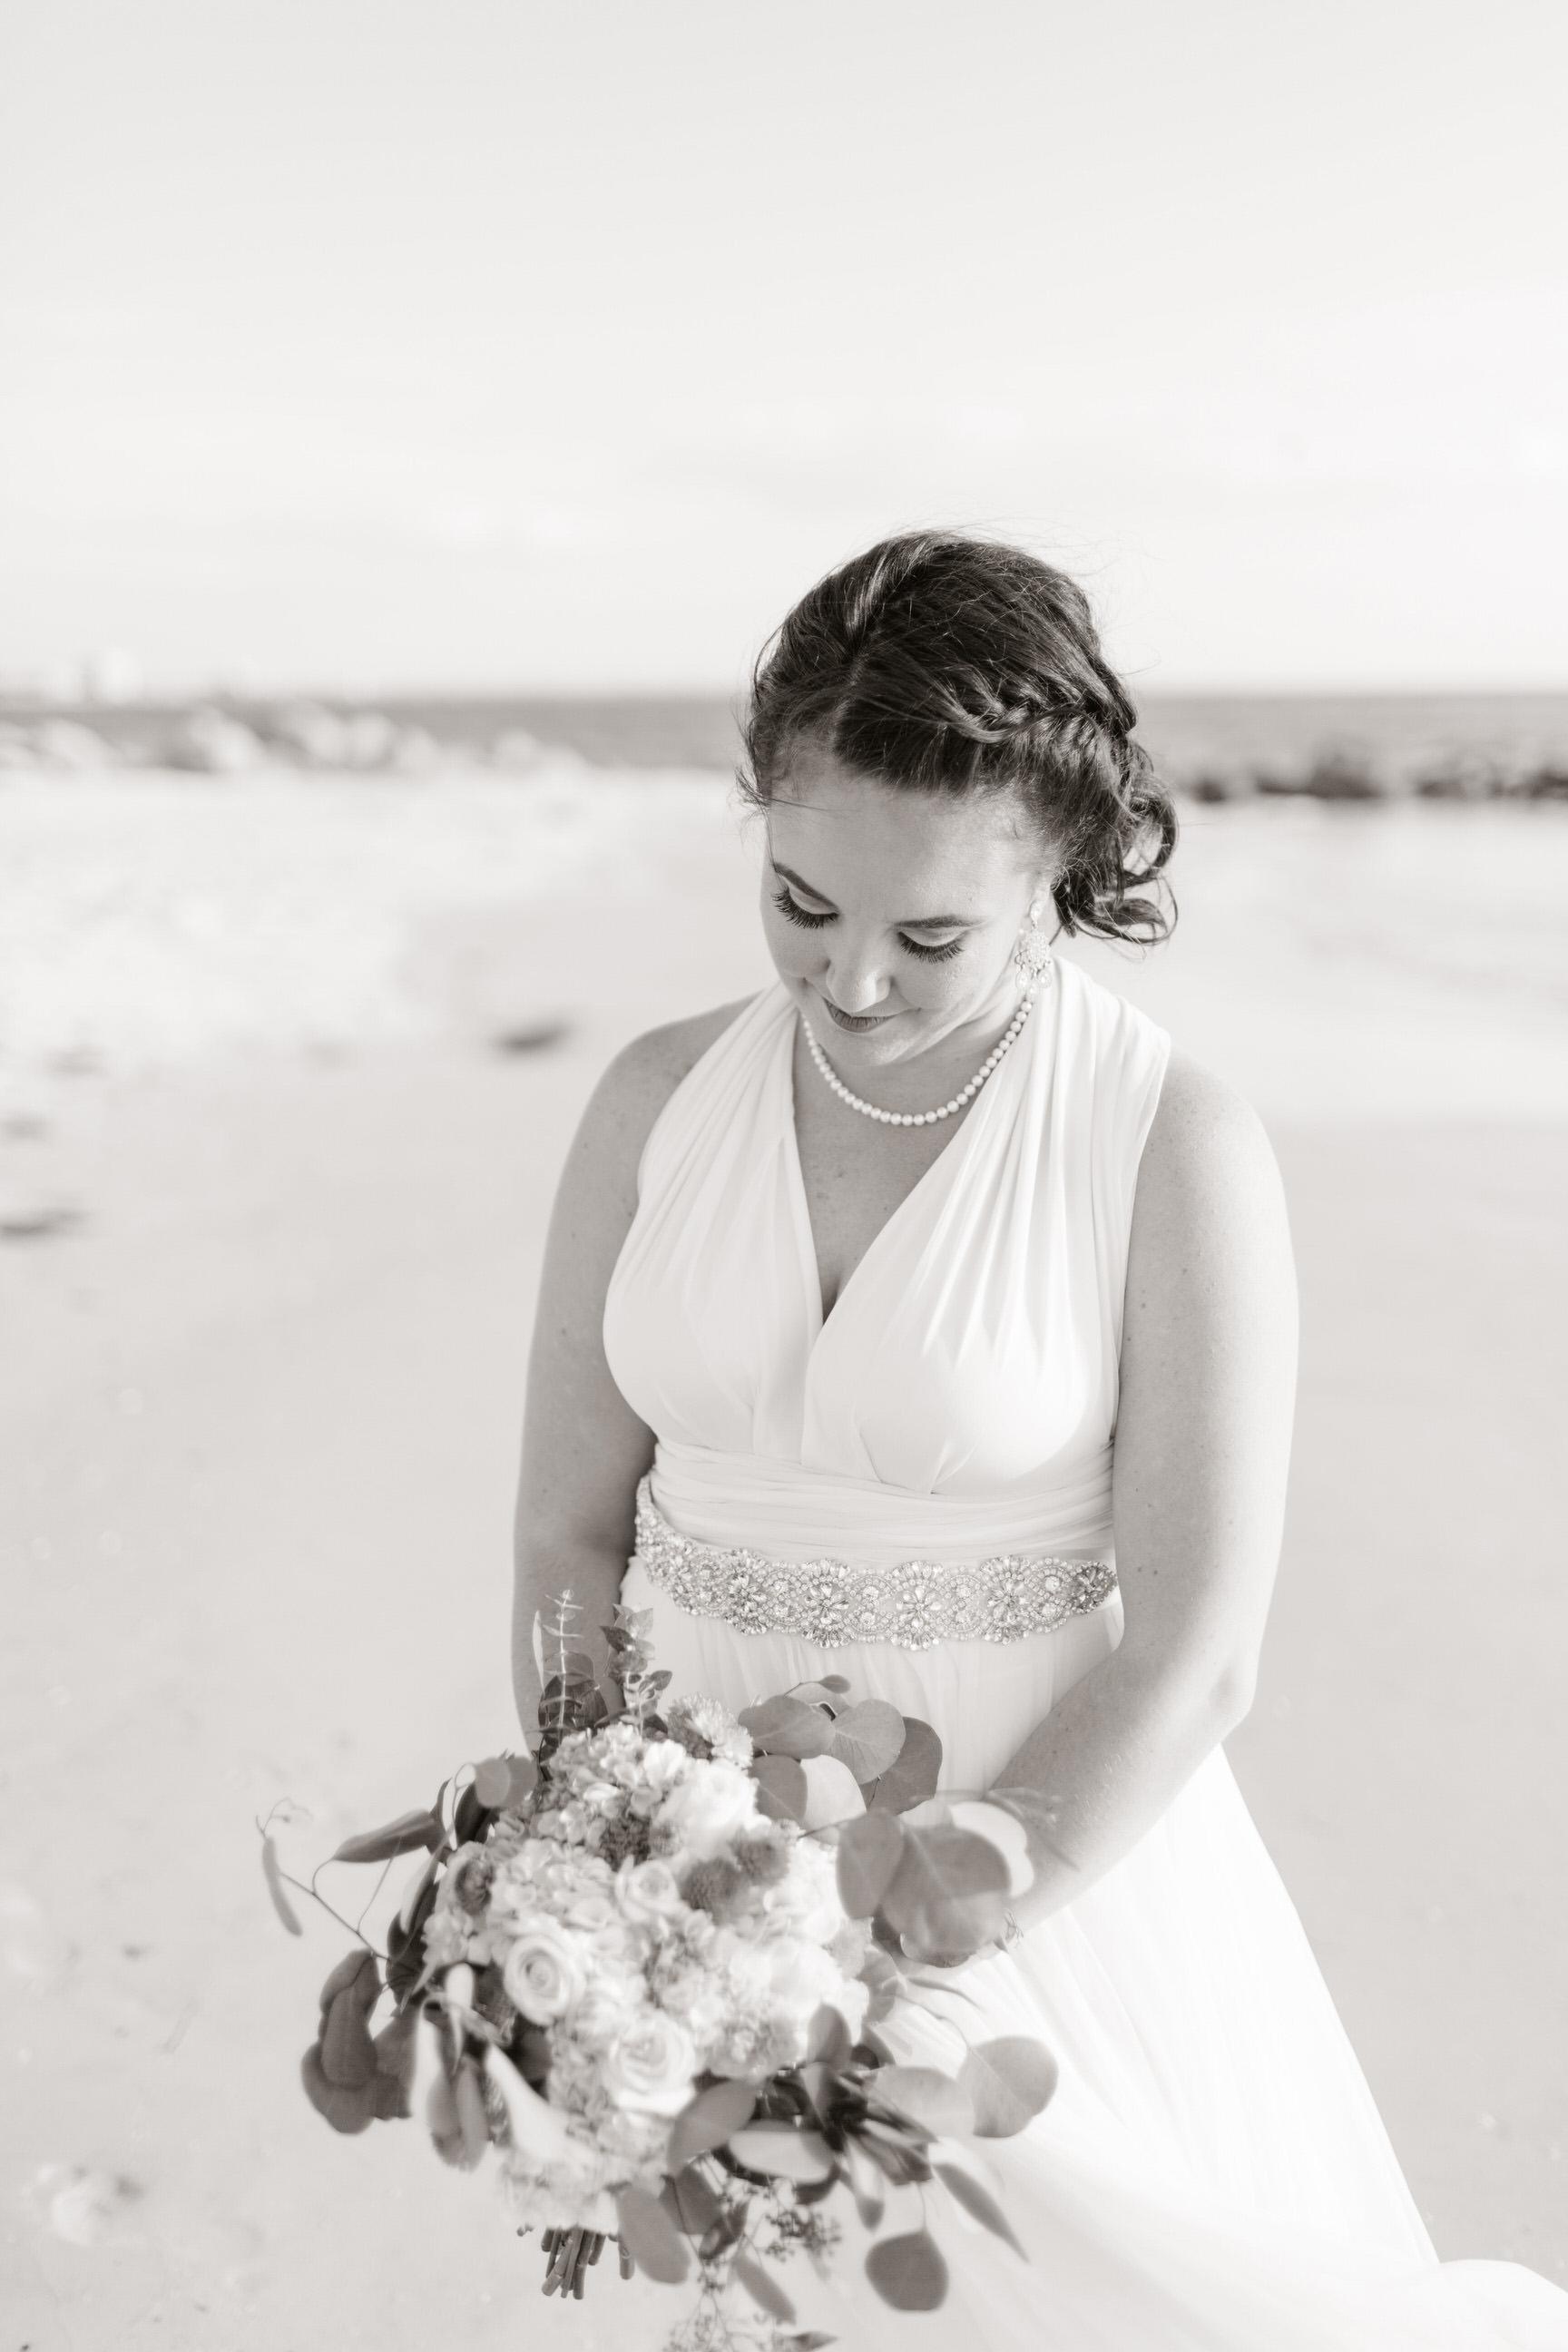 Beltran_Treasure_Island_Elopement_Tampa_Wedding_082-1.jpg